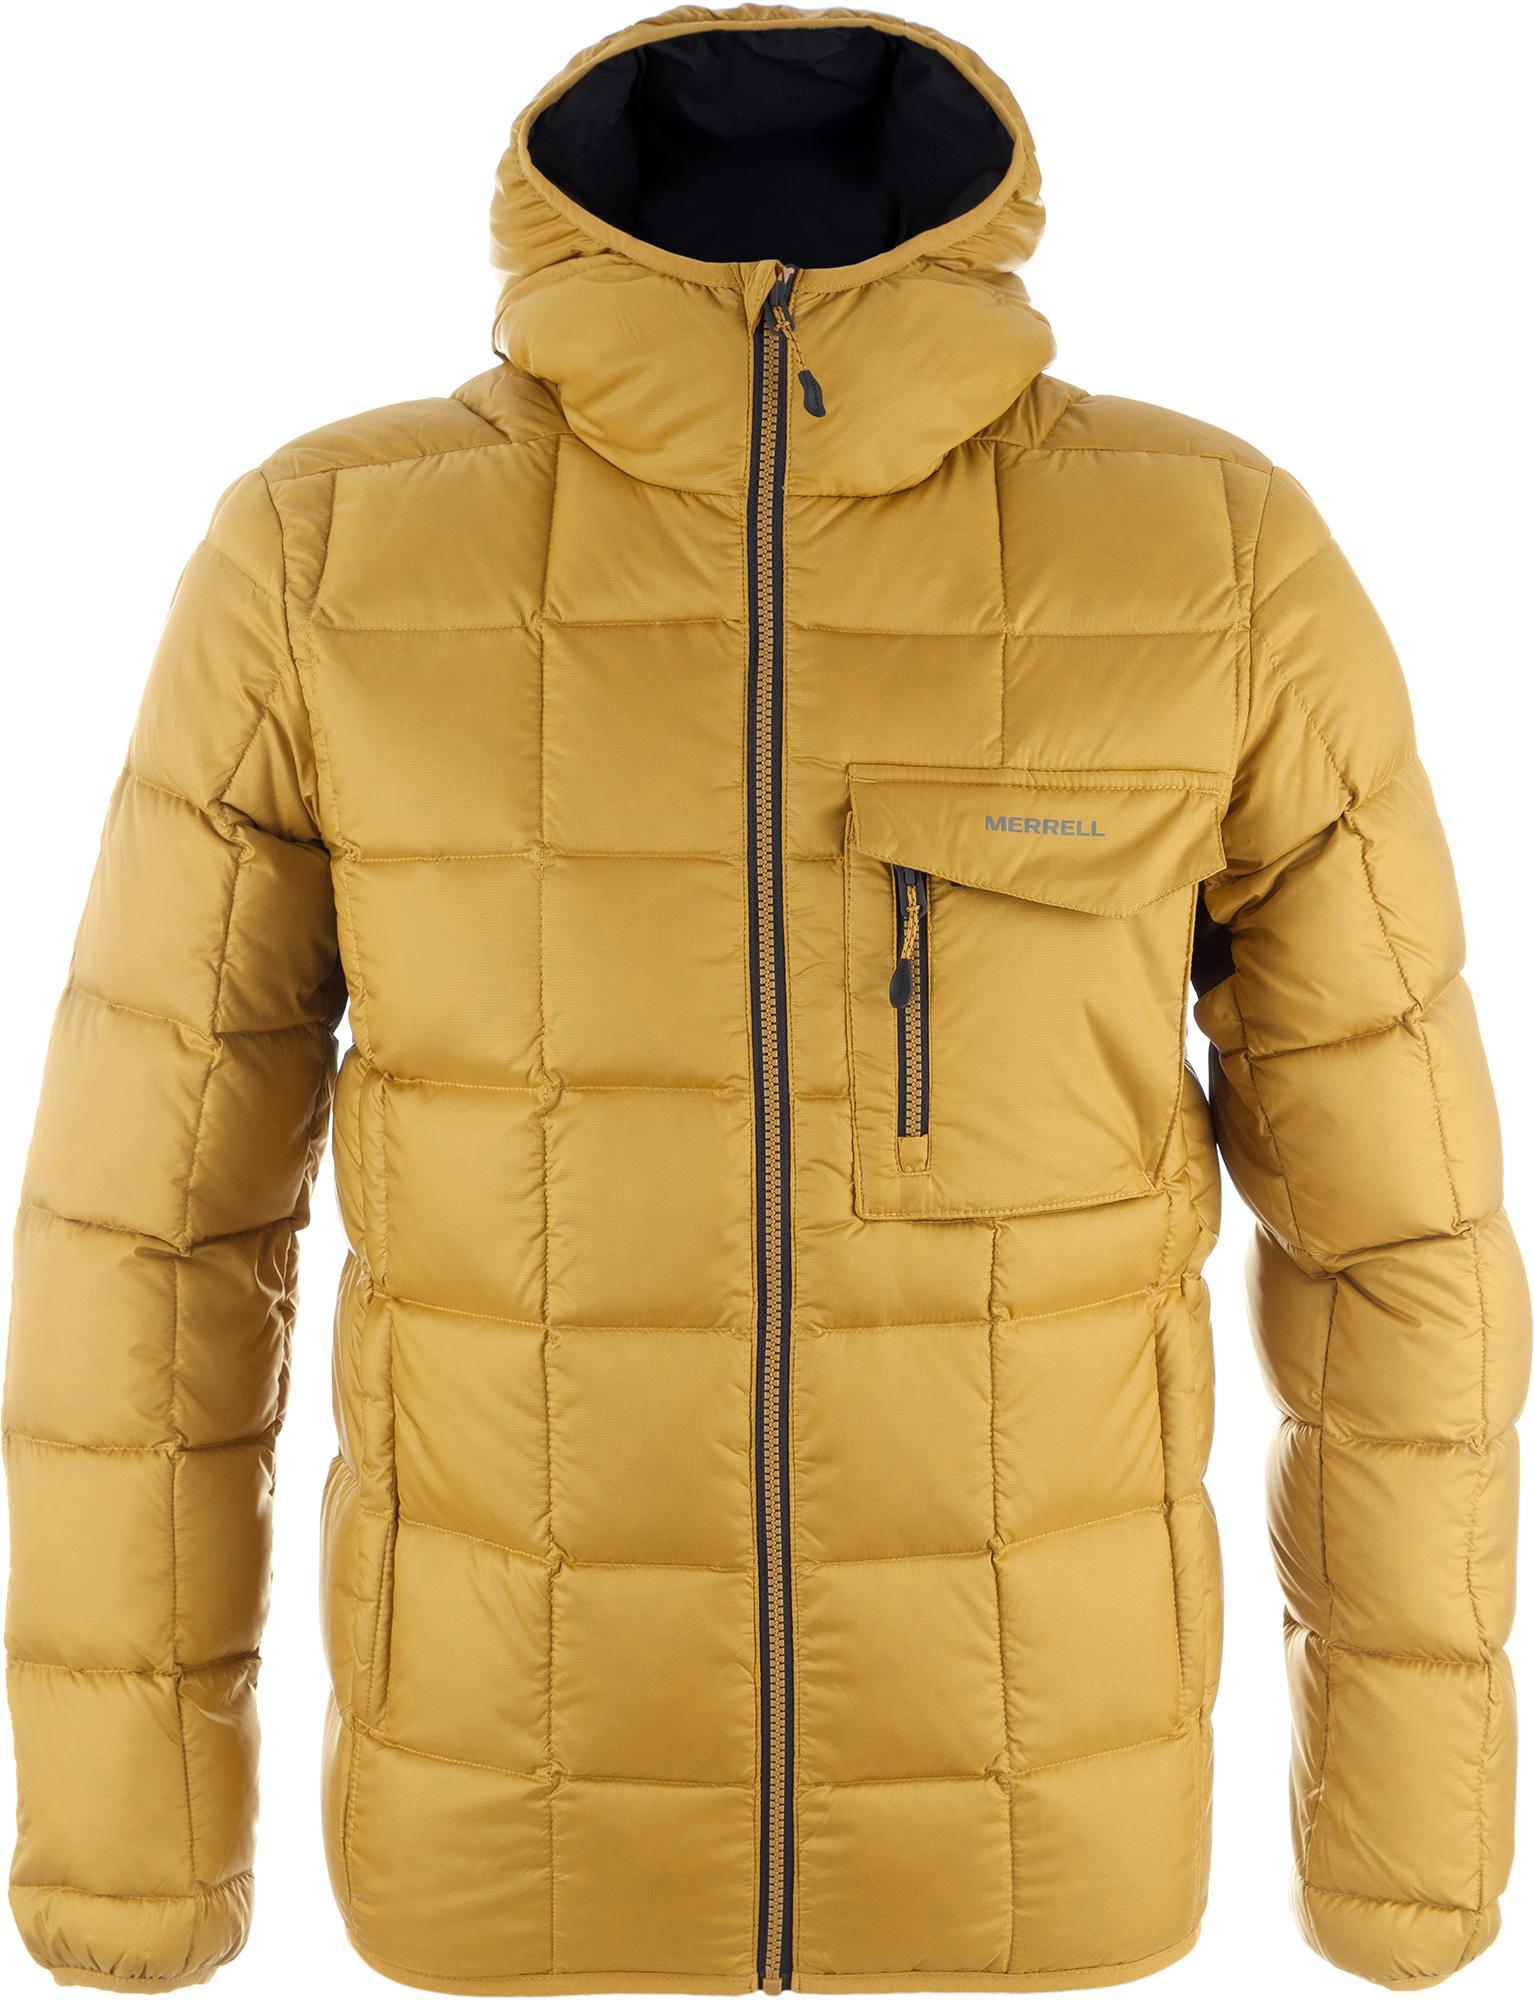 Merrell Куртка пуховая мужская Merrell merrell куртка утепленная женская merrell